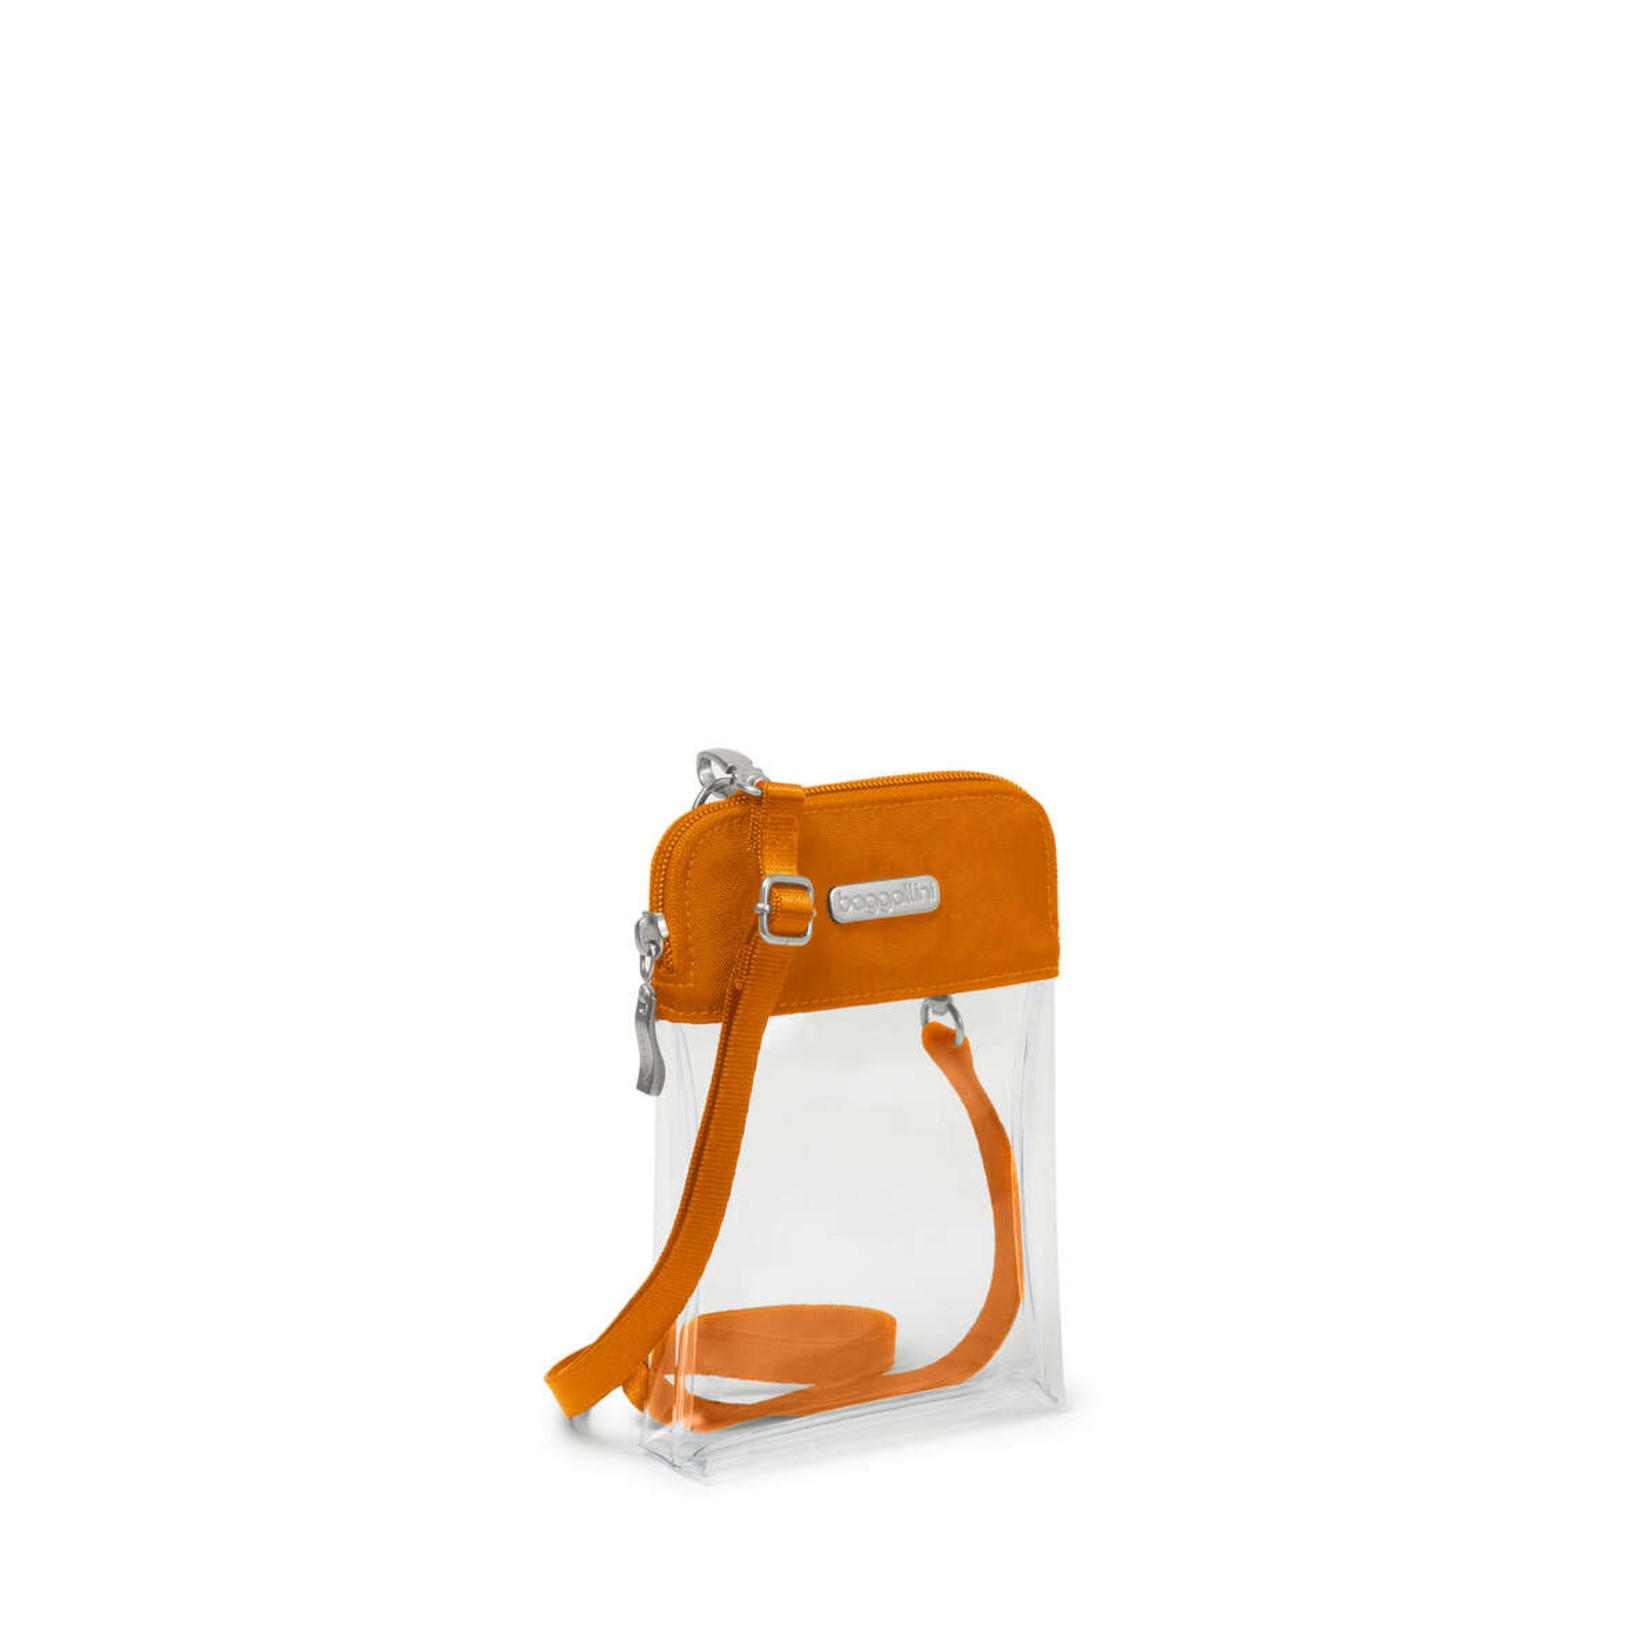 Baggallini Clear Event Compliant Bryant Crossbody - Orange